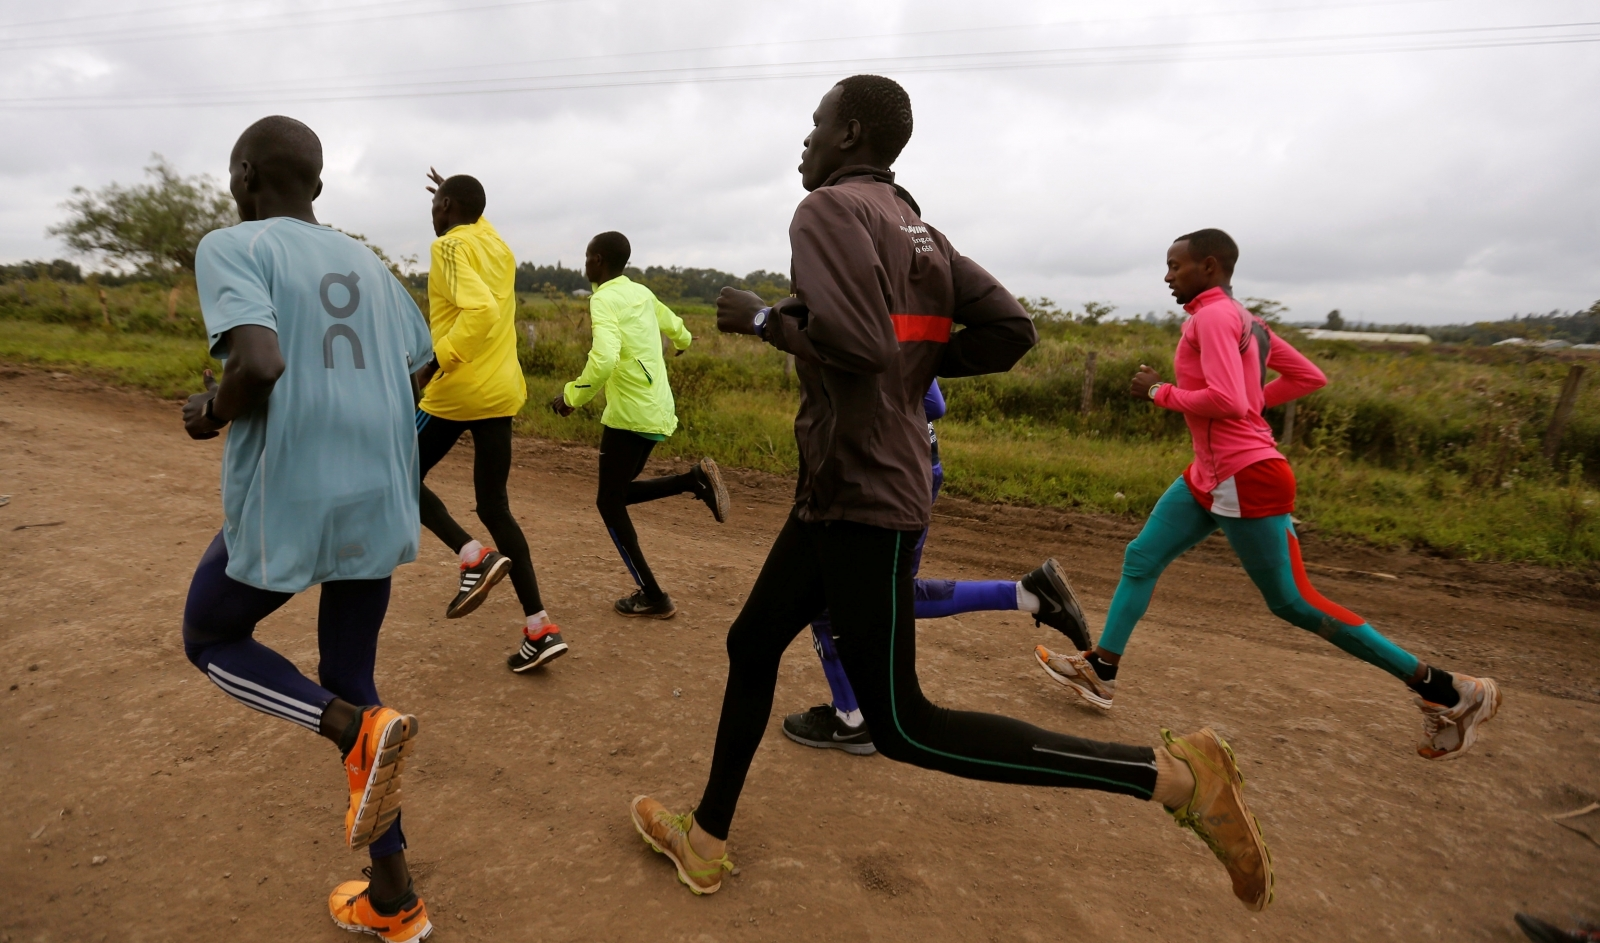 Sierra Leone bans jogging